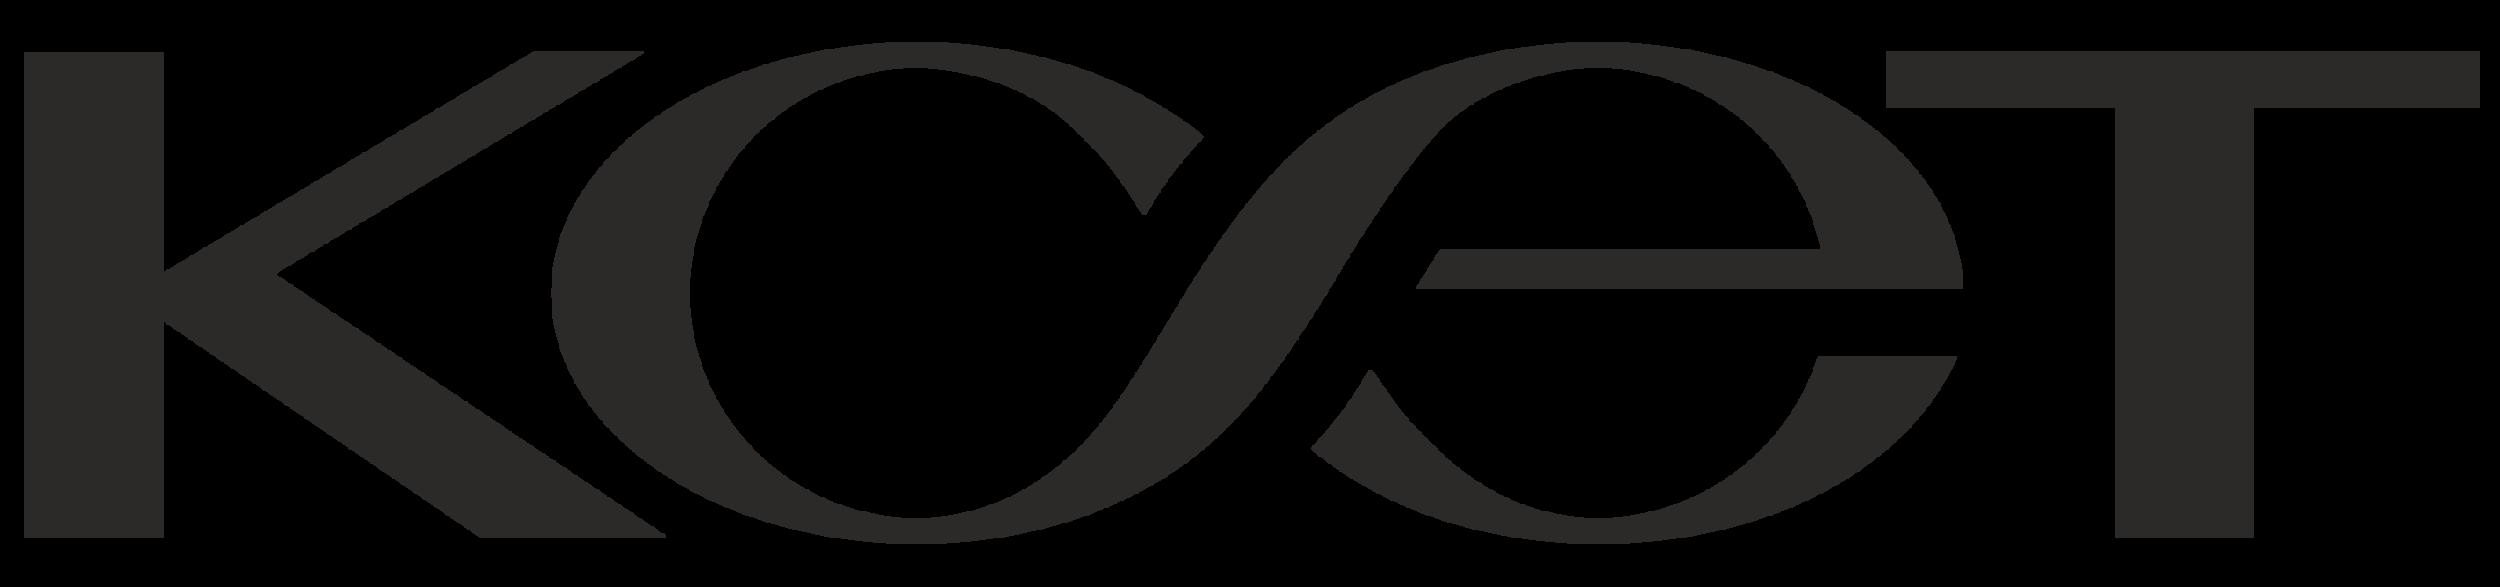 logo_kcet_secondary_blk.png